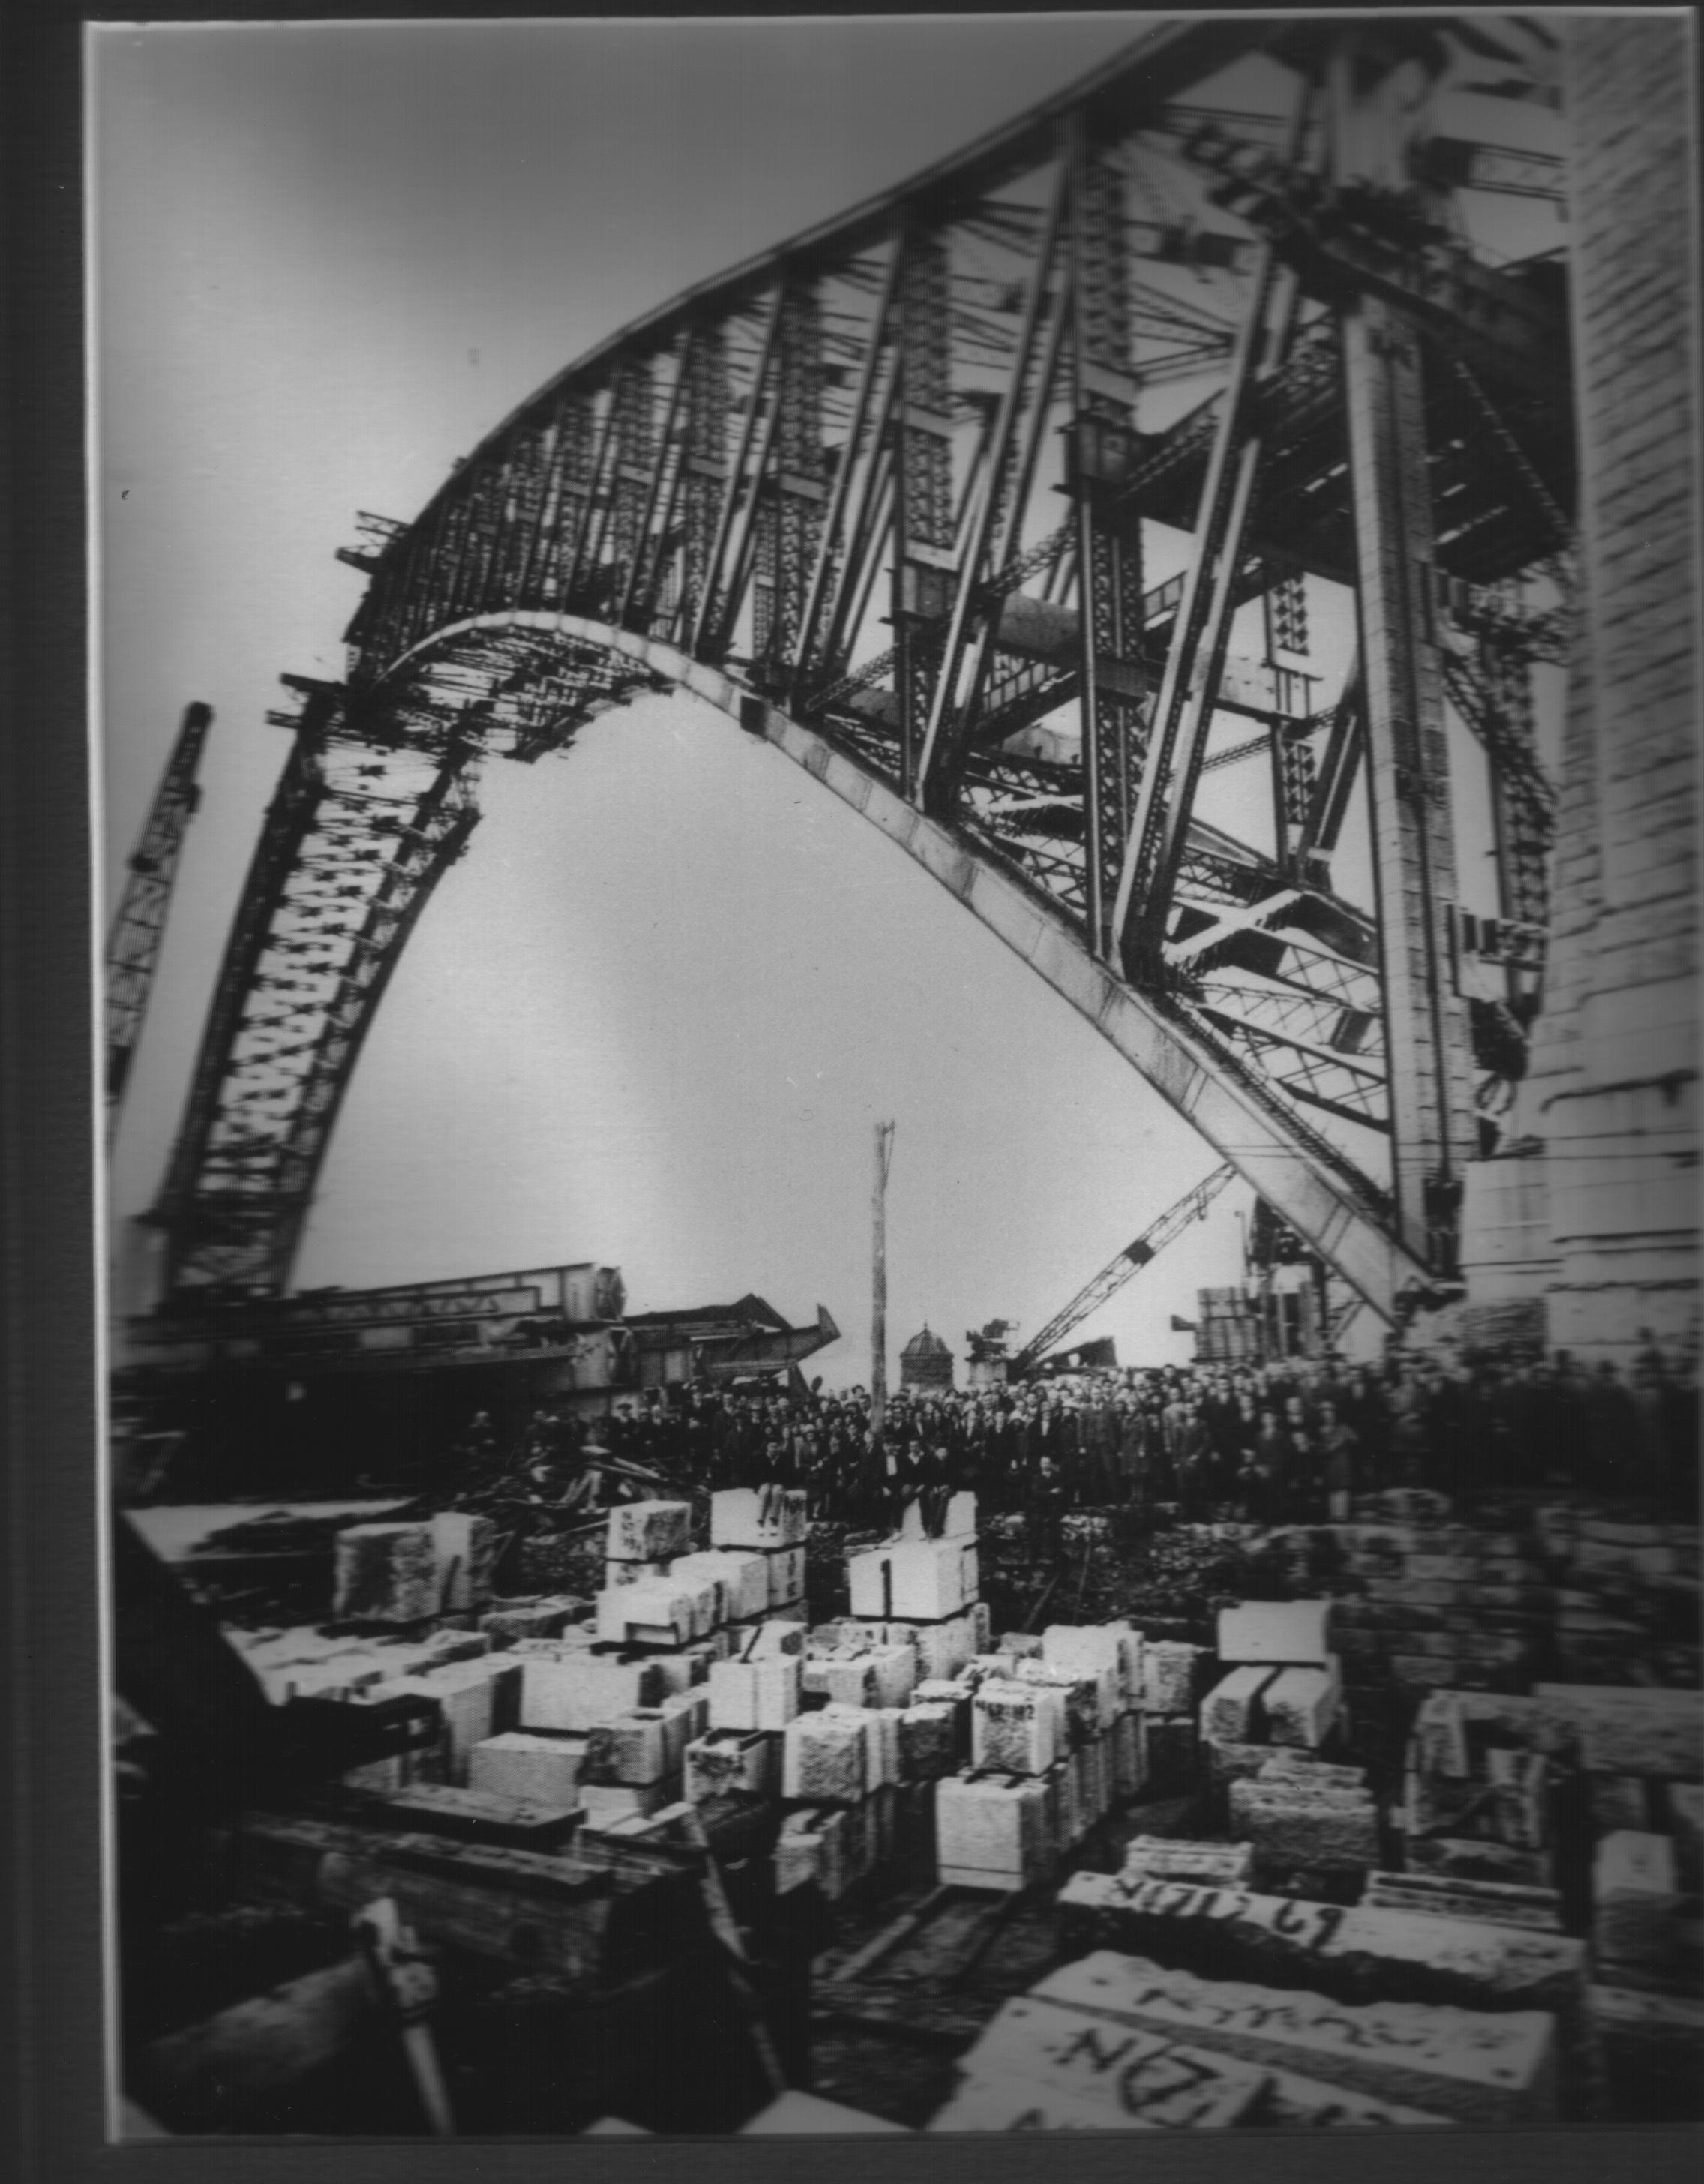 Inside History Magazine To Make A Bridge Where Did The